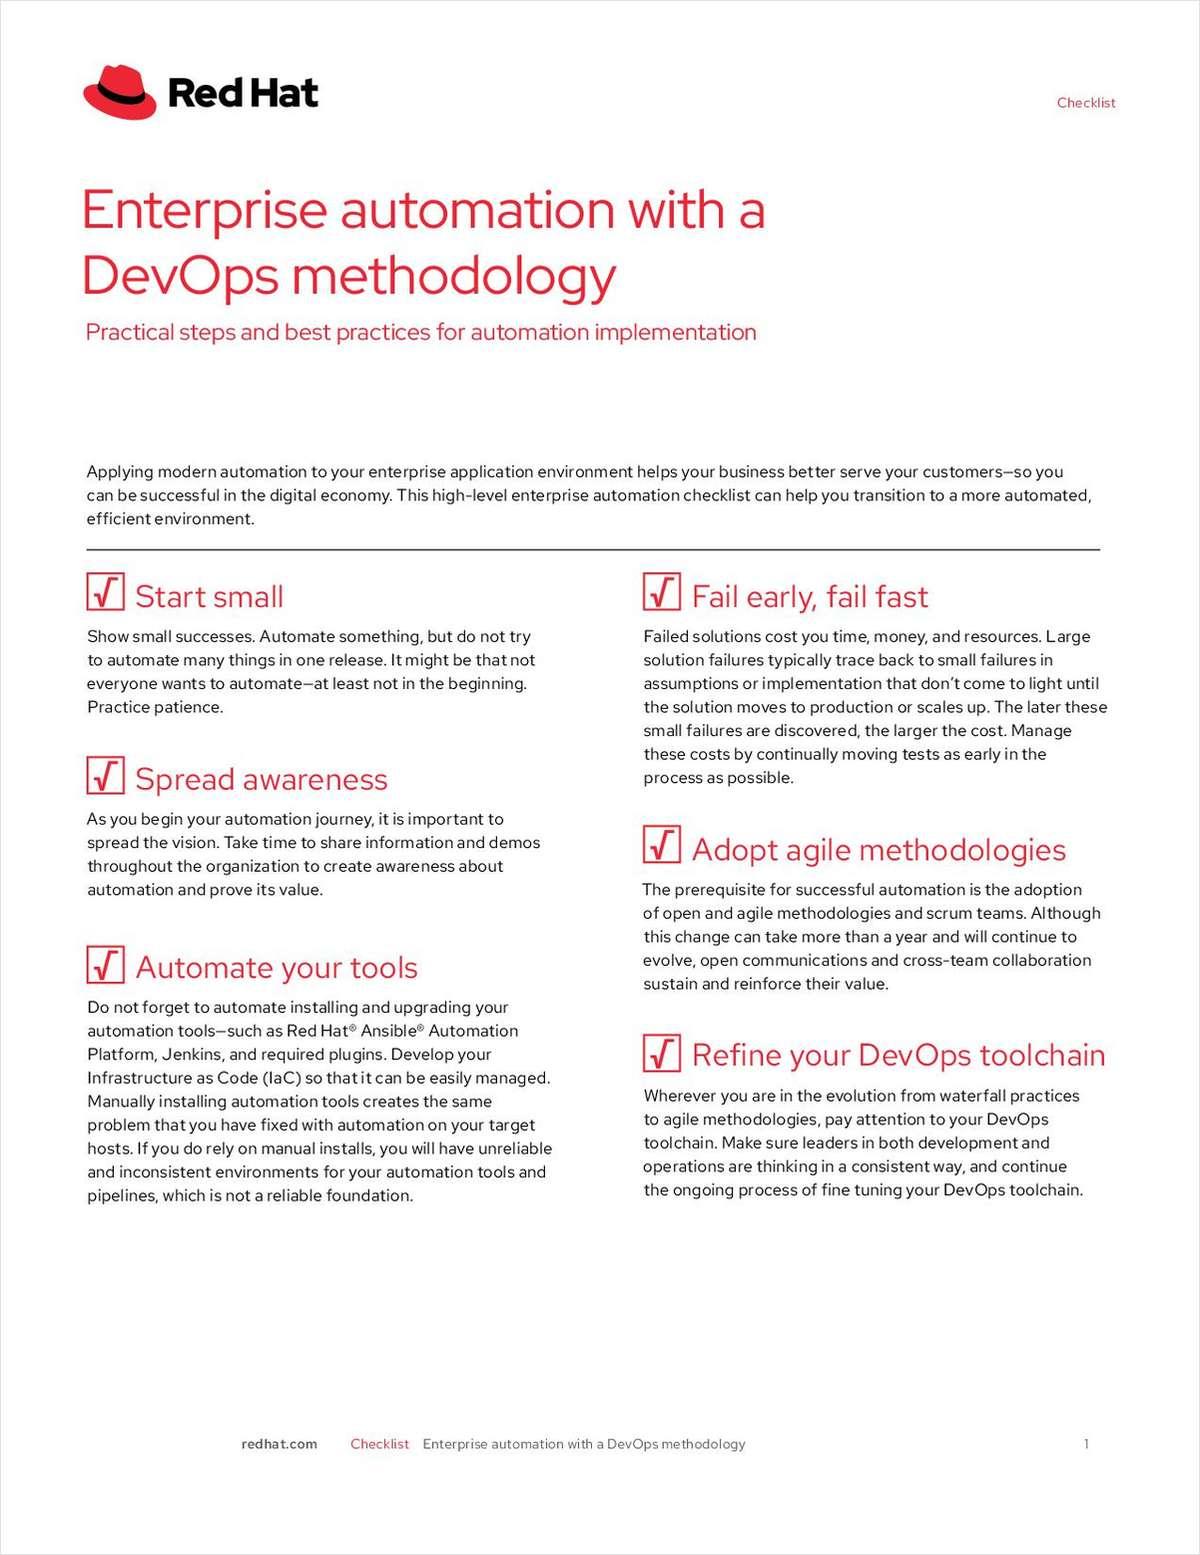 Enterprise Automation with a DevOps Methodology